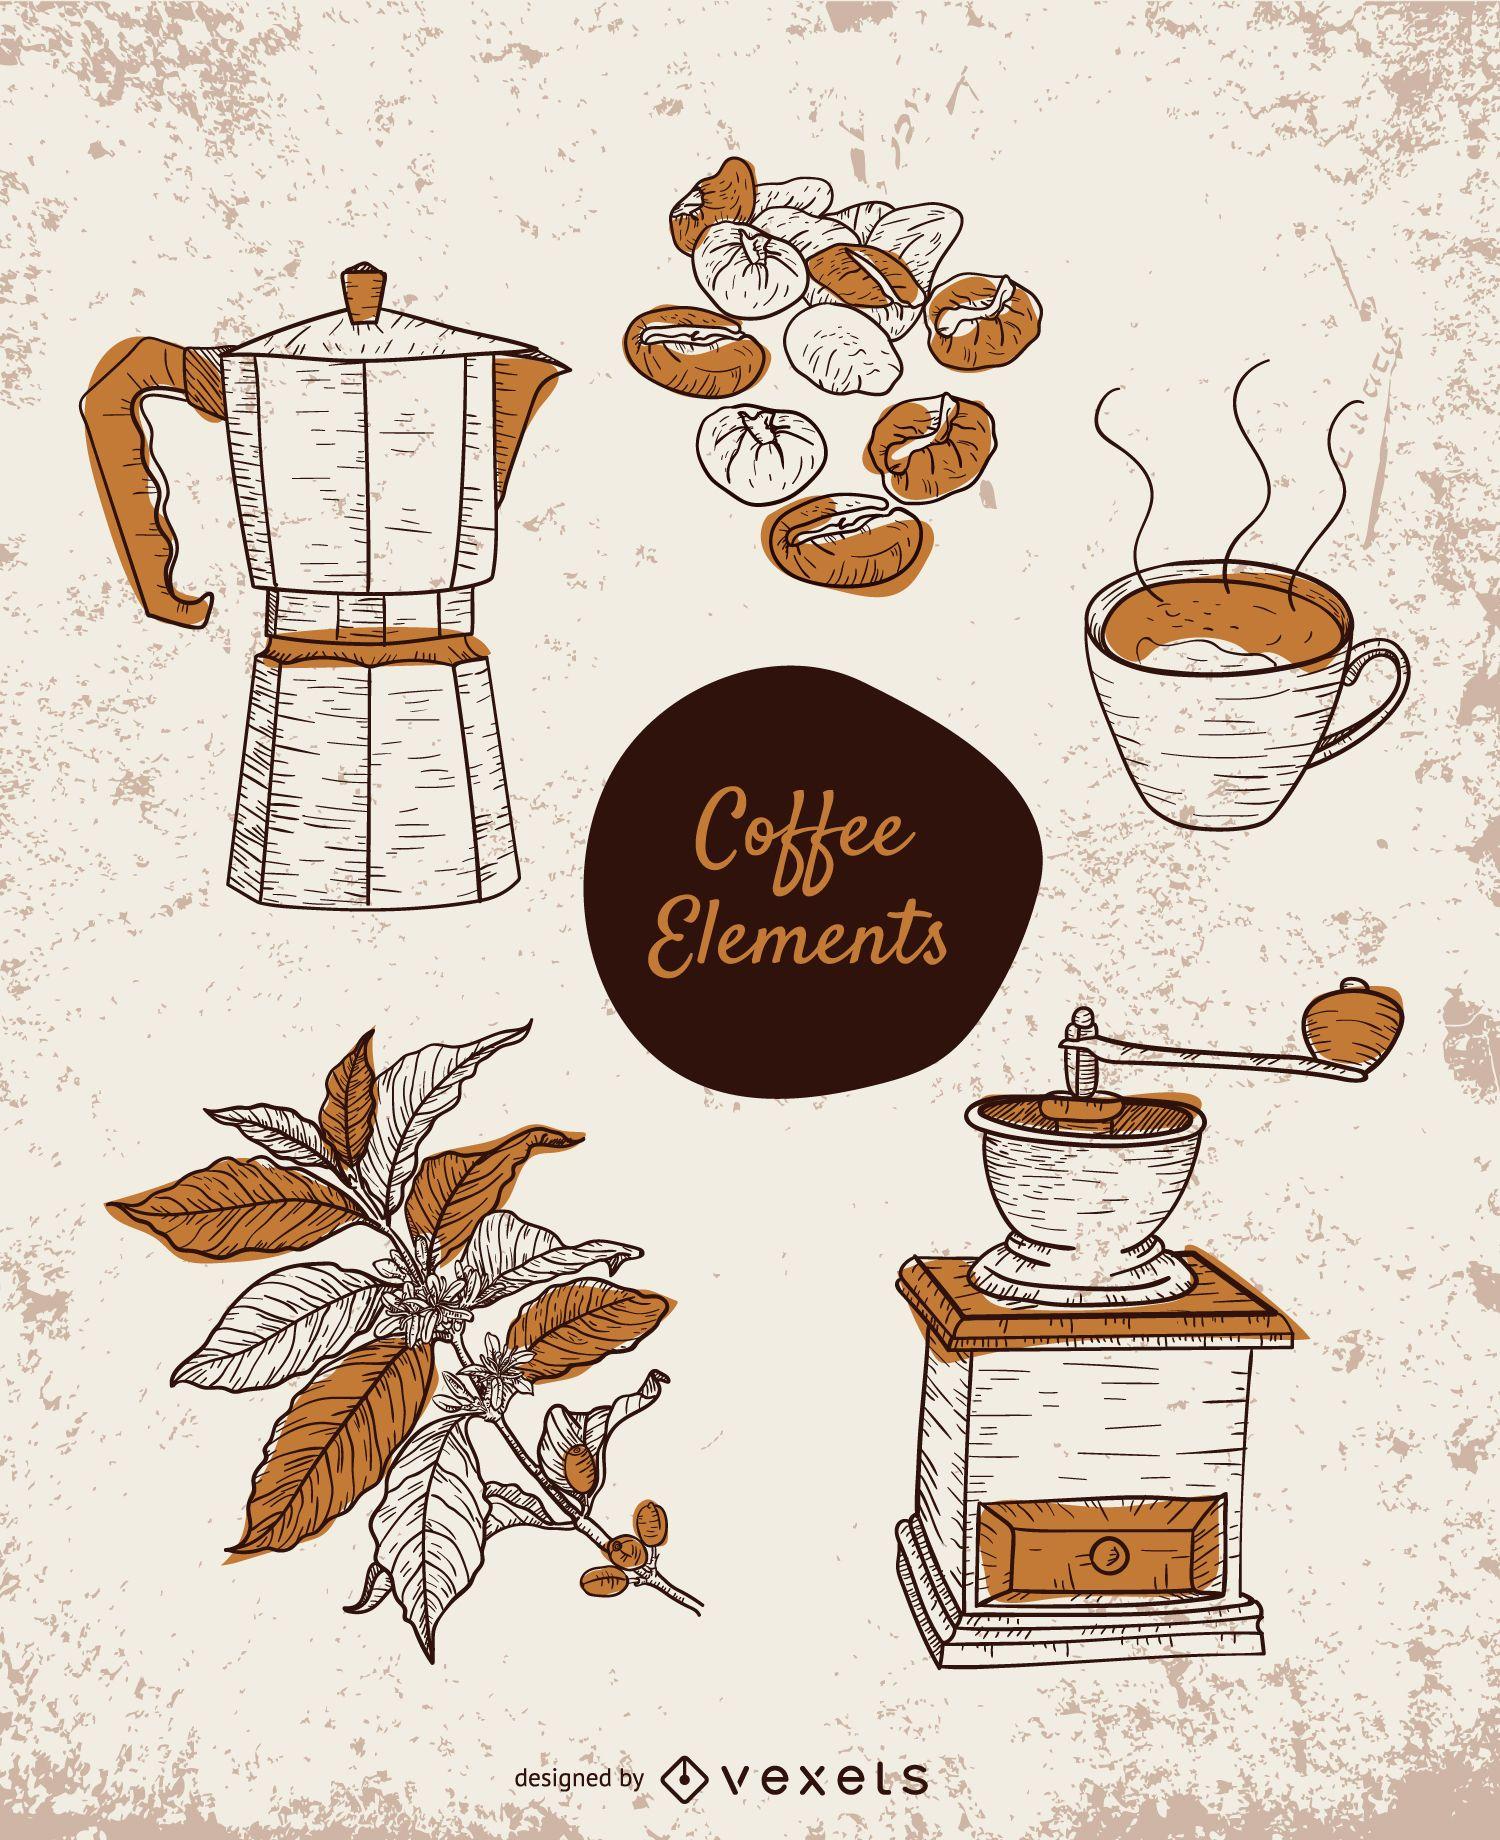 Conjunto de elementos de café dibujados a mano